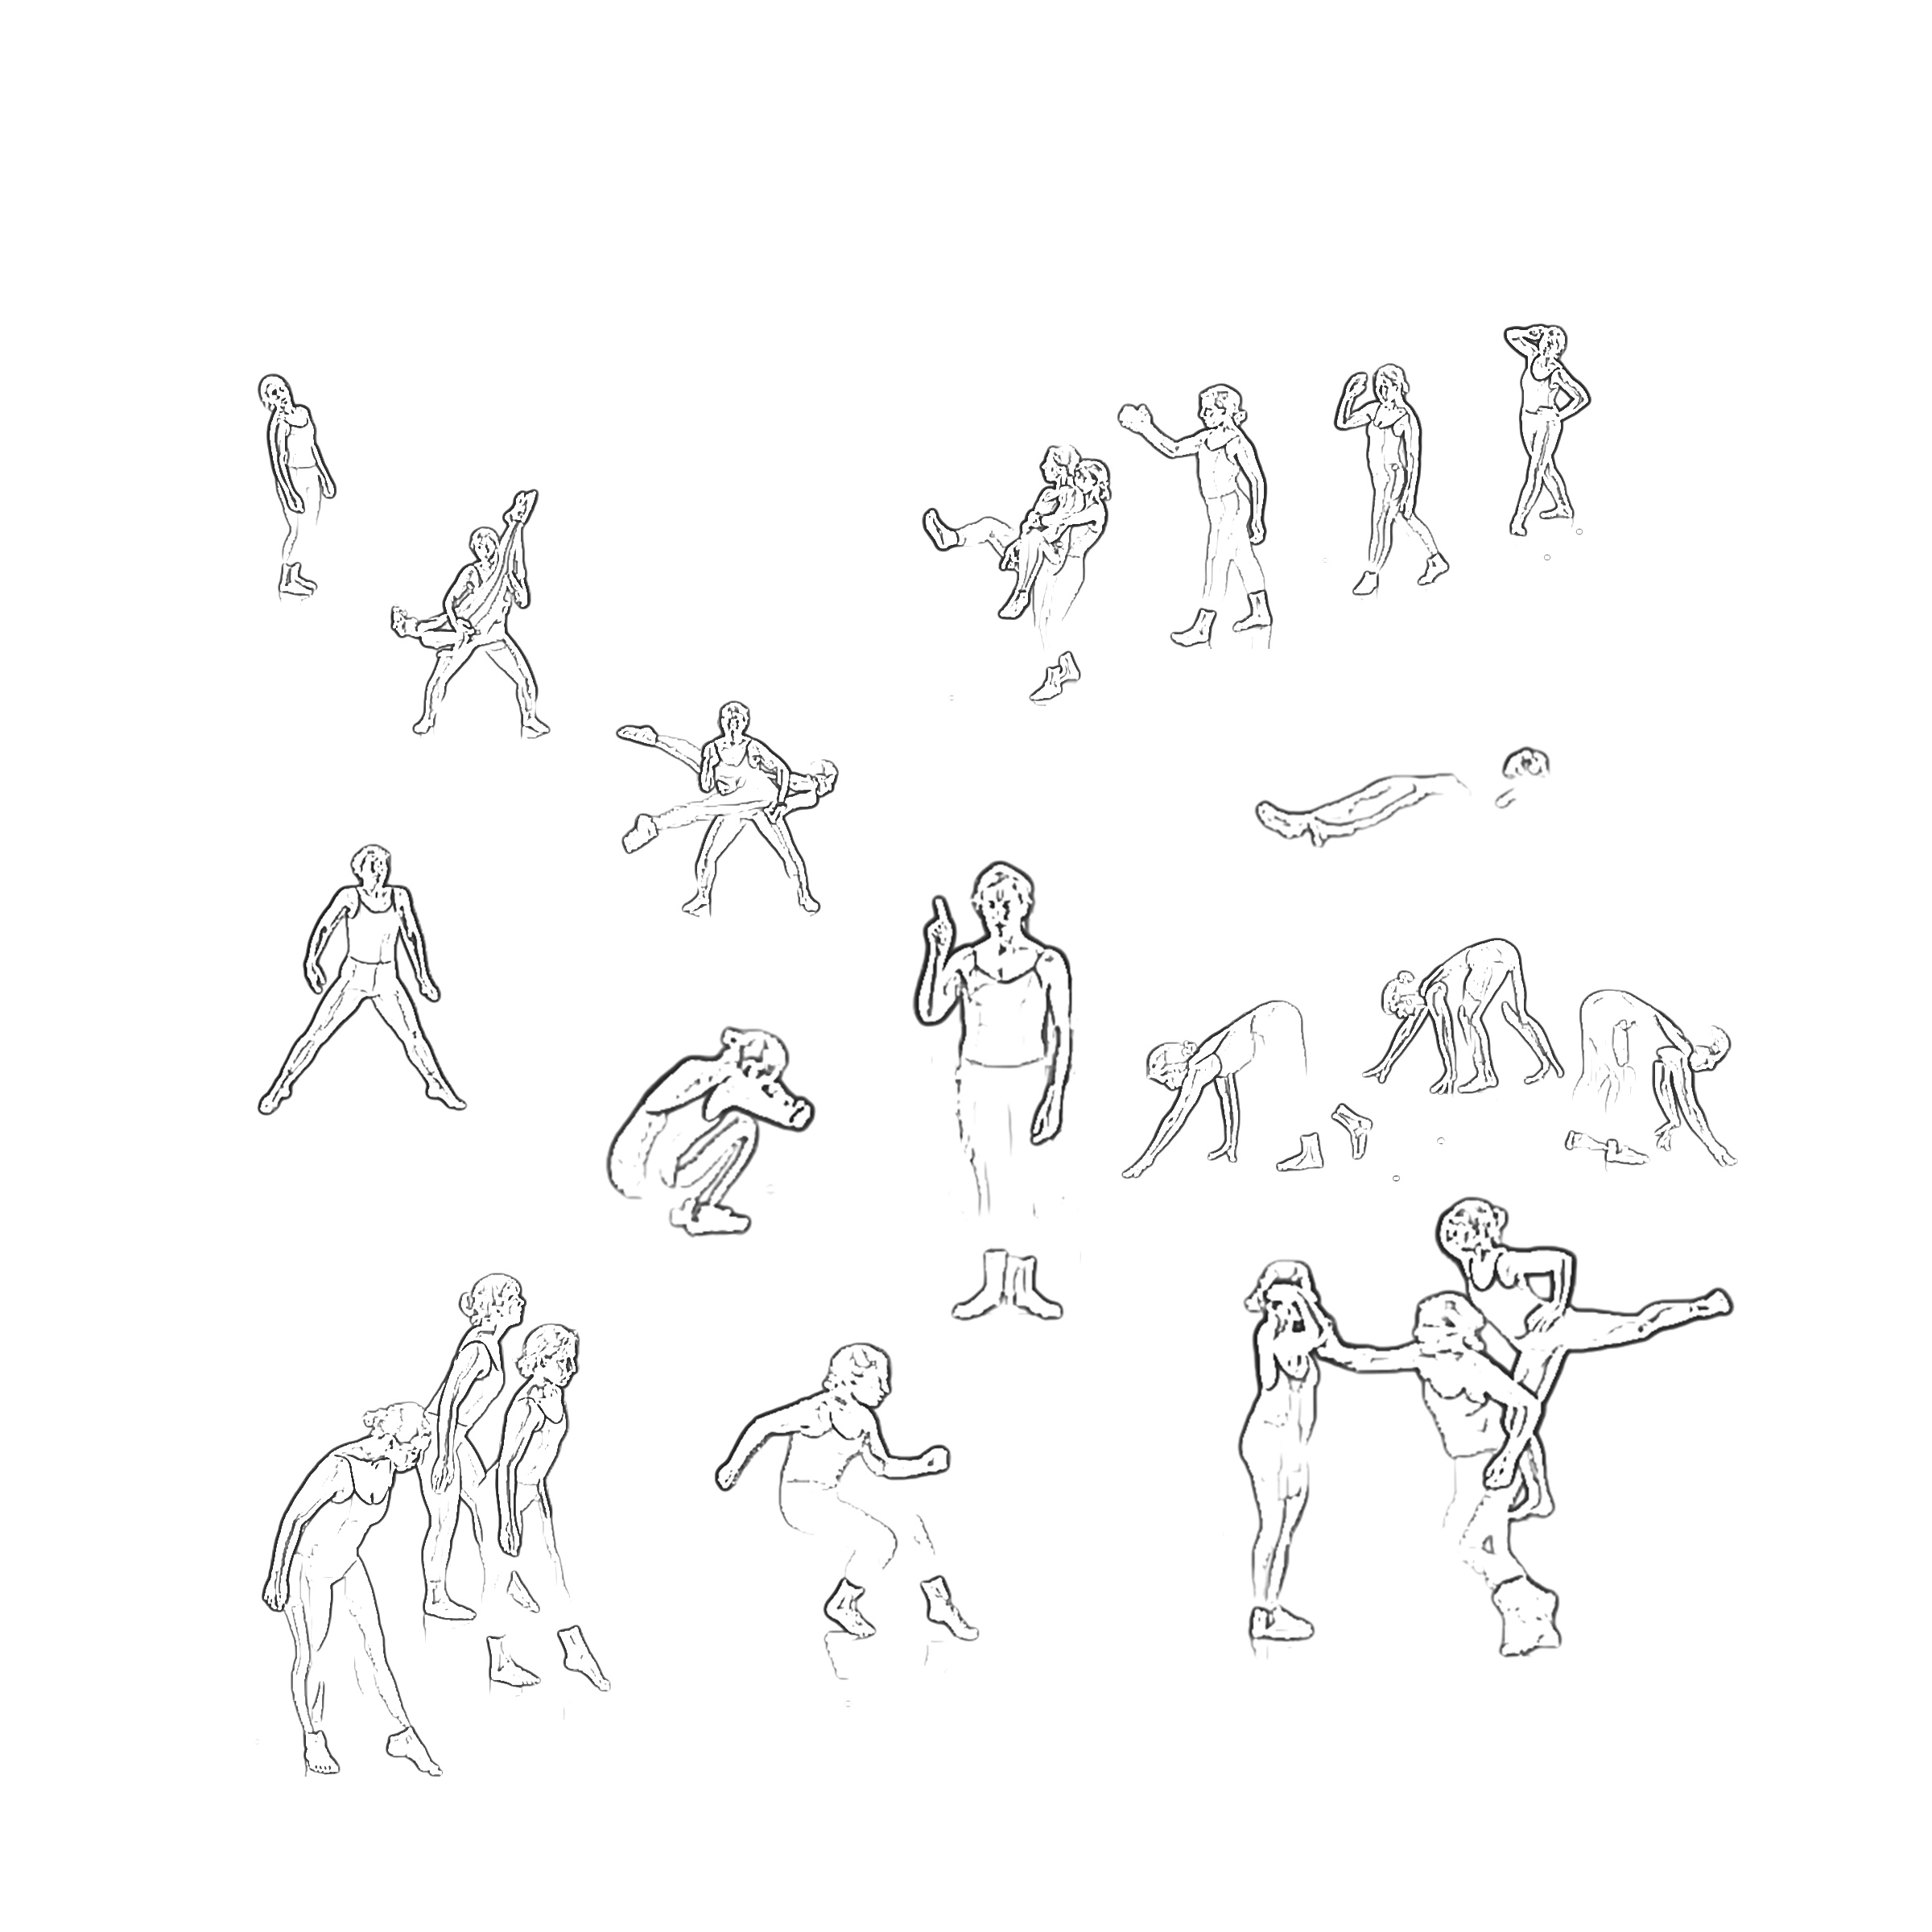 Drawn Dances , video, mixed-media, 2012/2013. Image by Sasha Amaya.